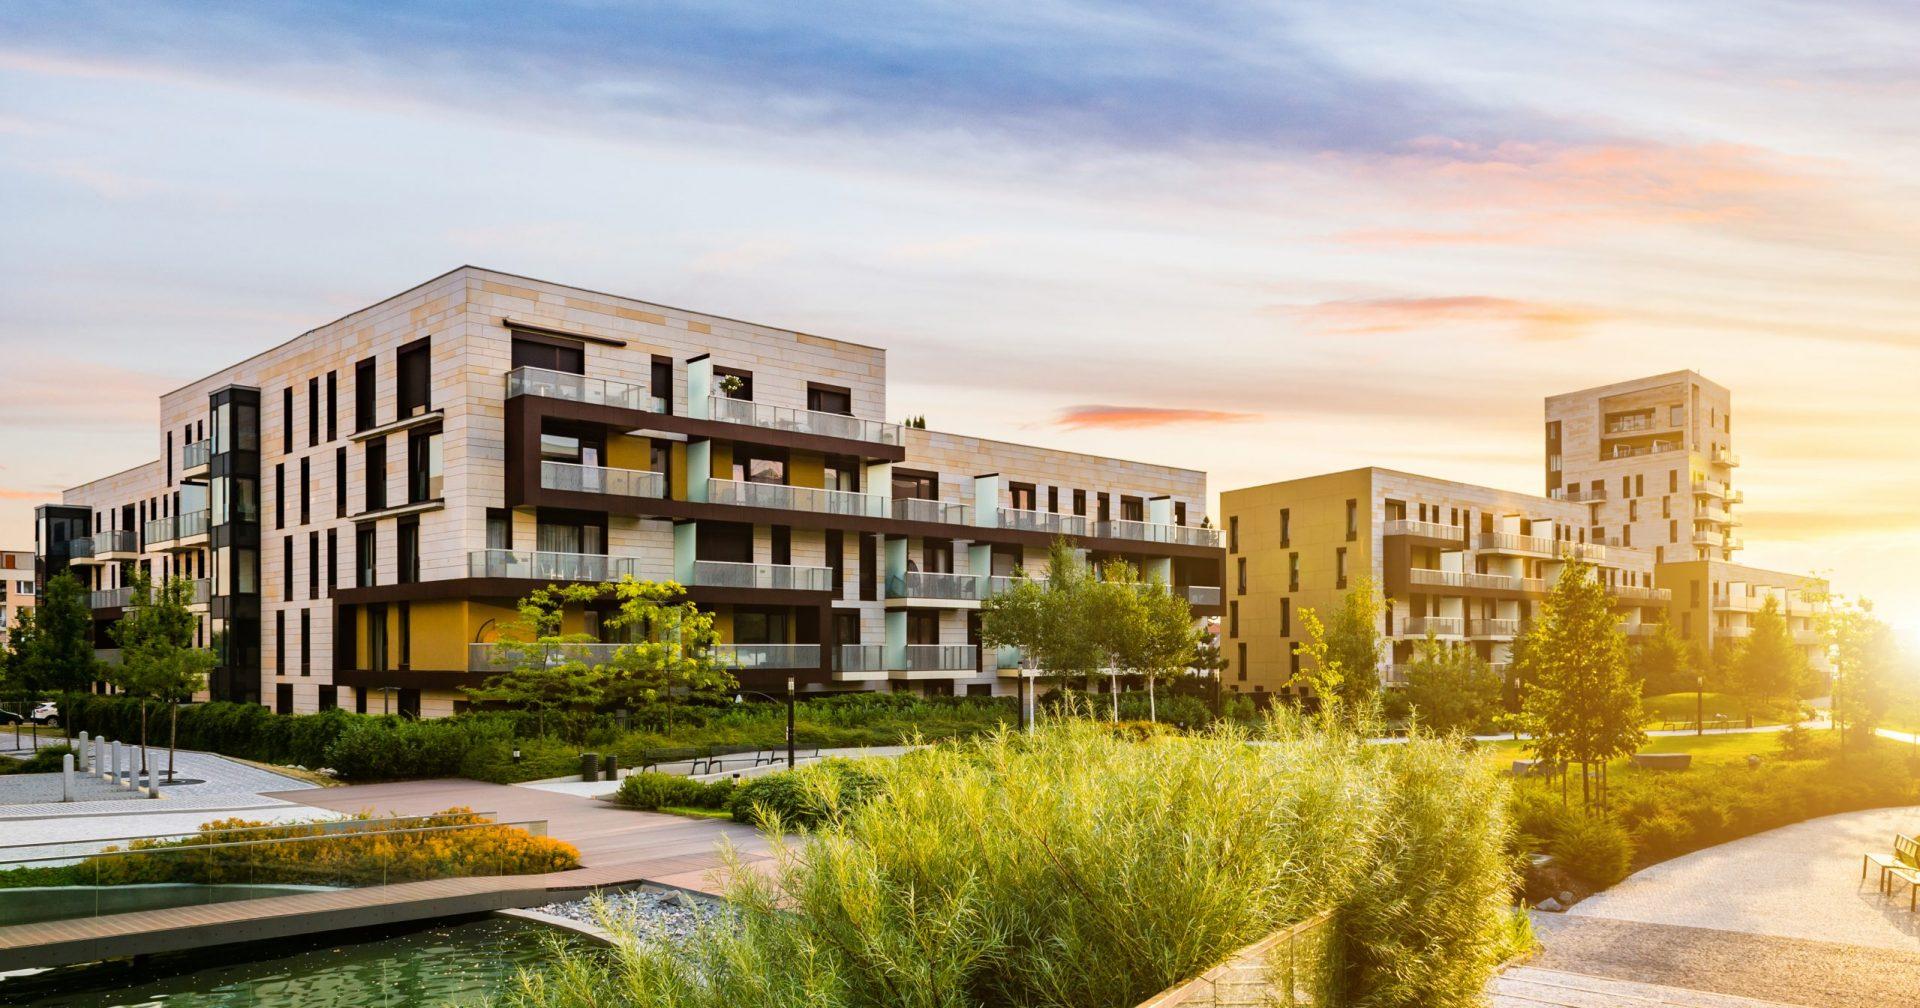 Immobilier Neuf Bordeaux | Eco Quartier Ginko